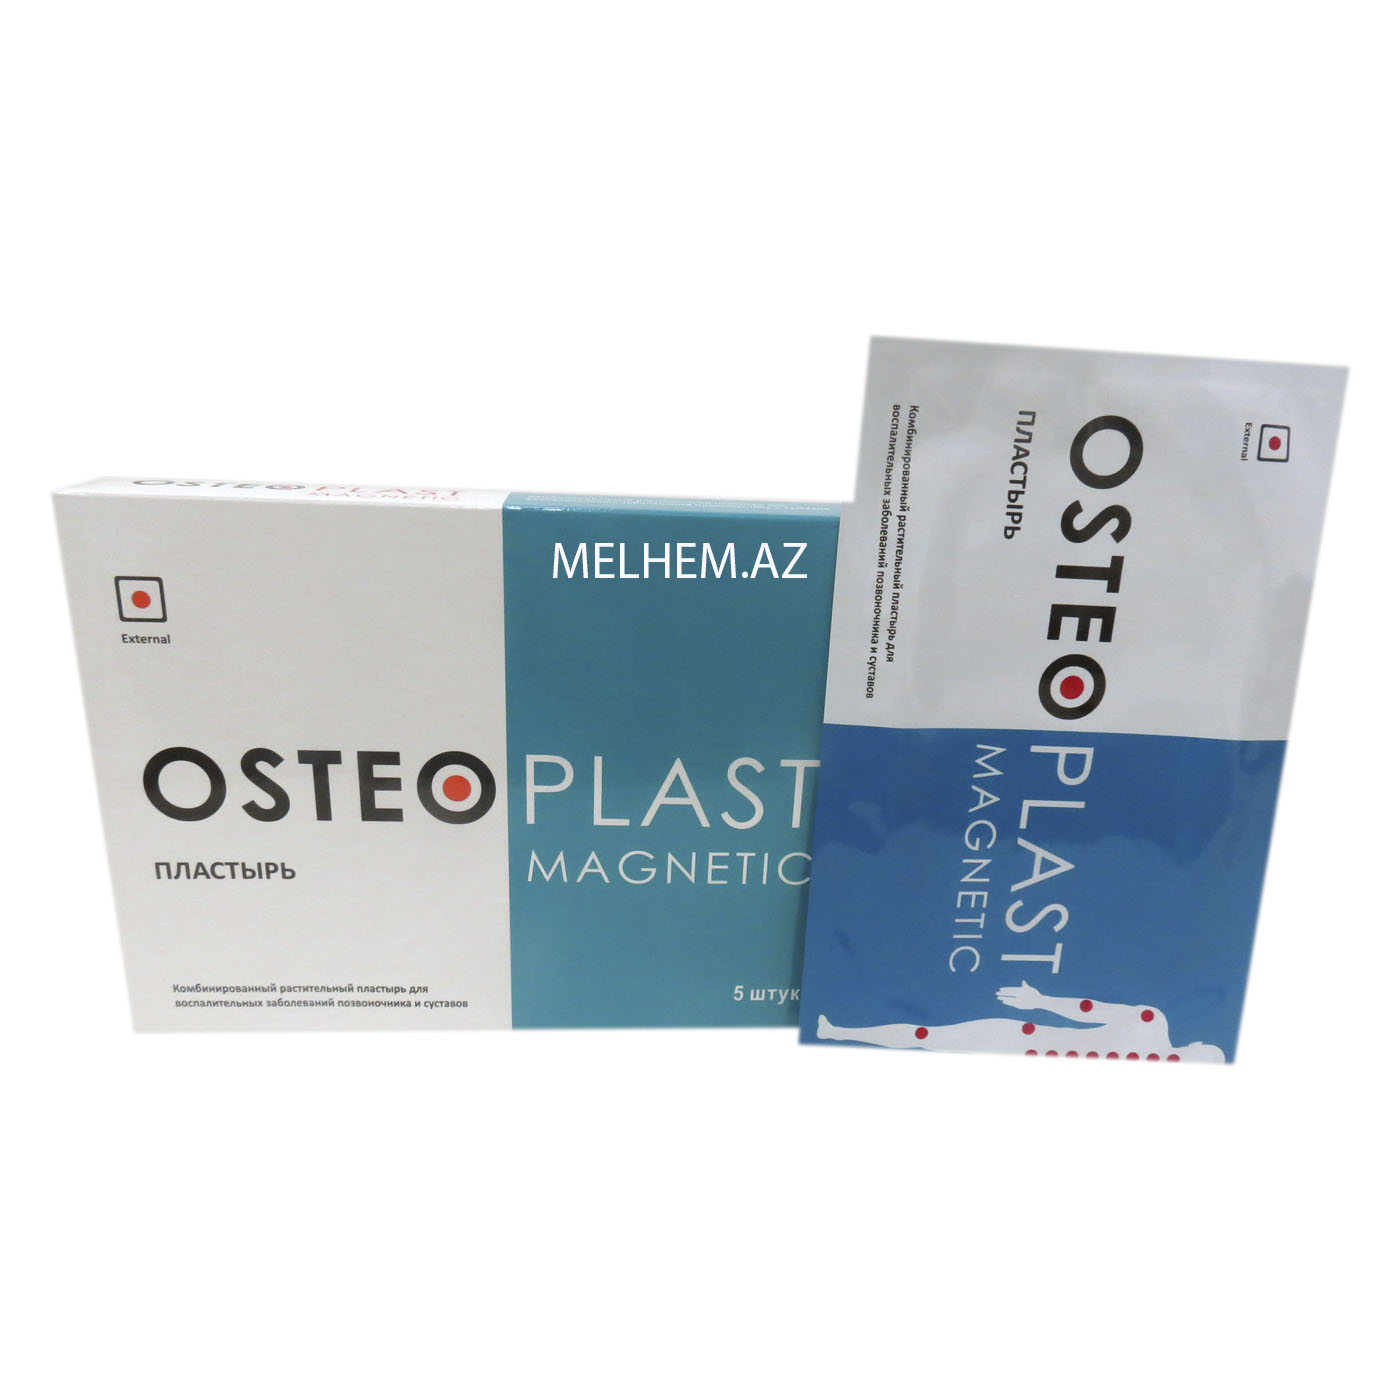 OSTEOPLAST MAGNETIK N5